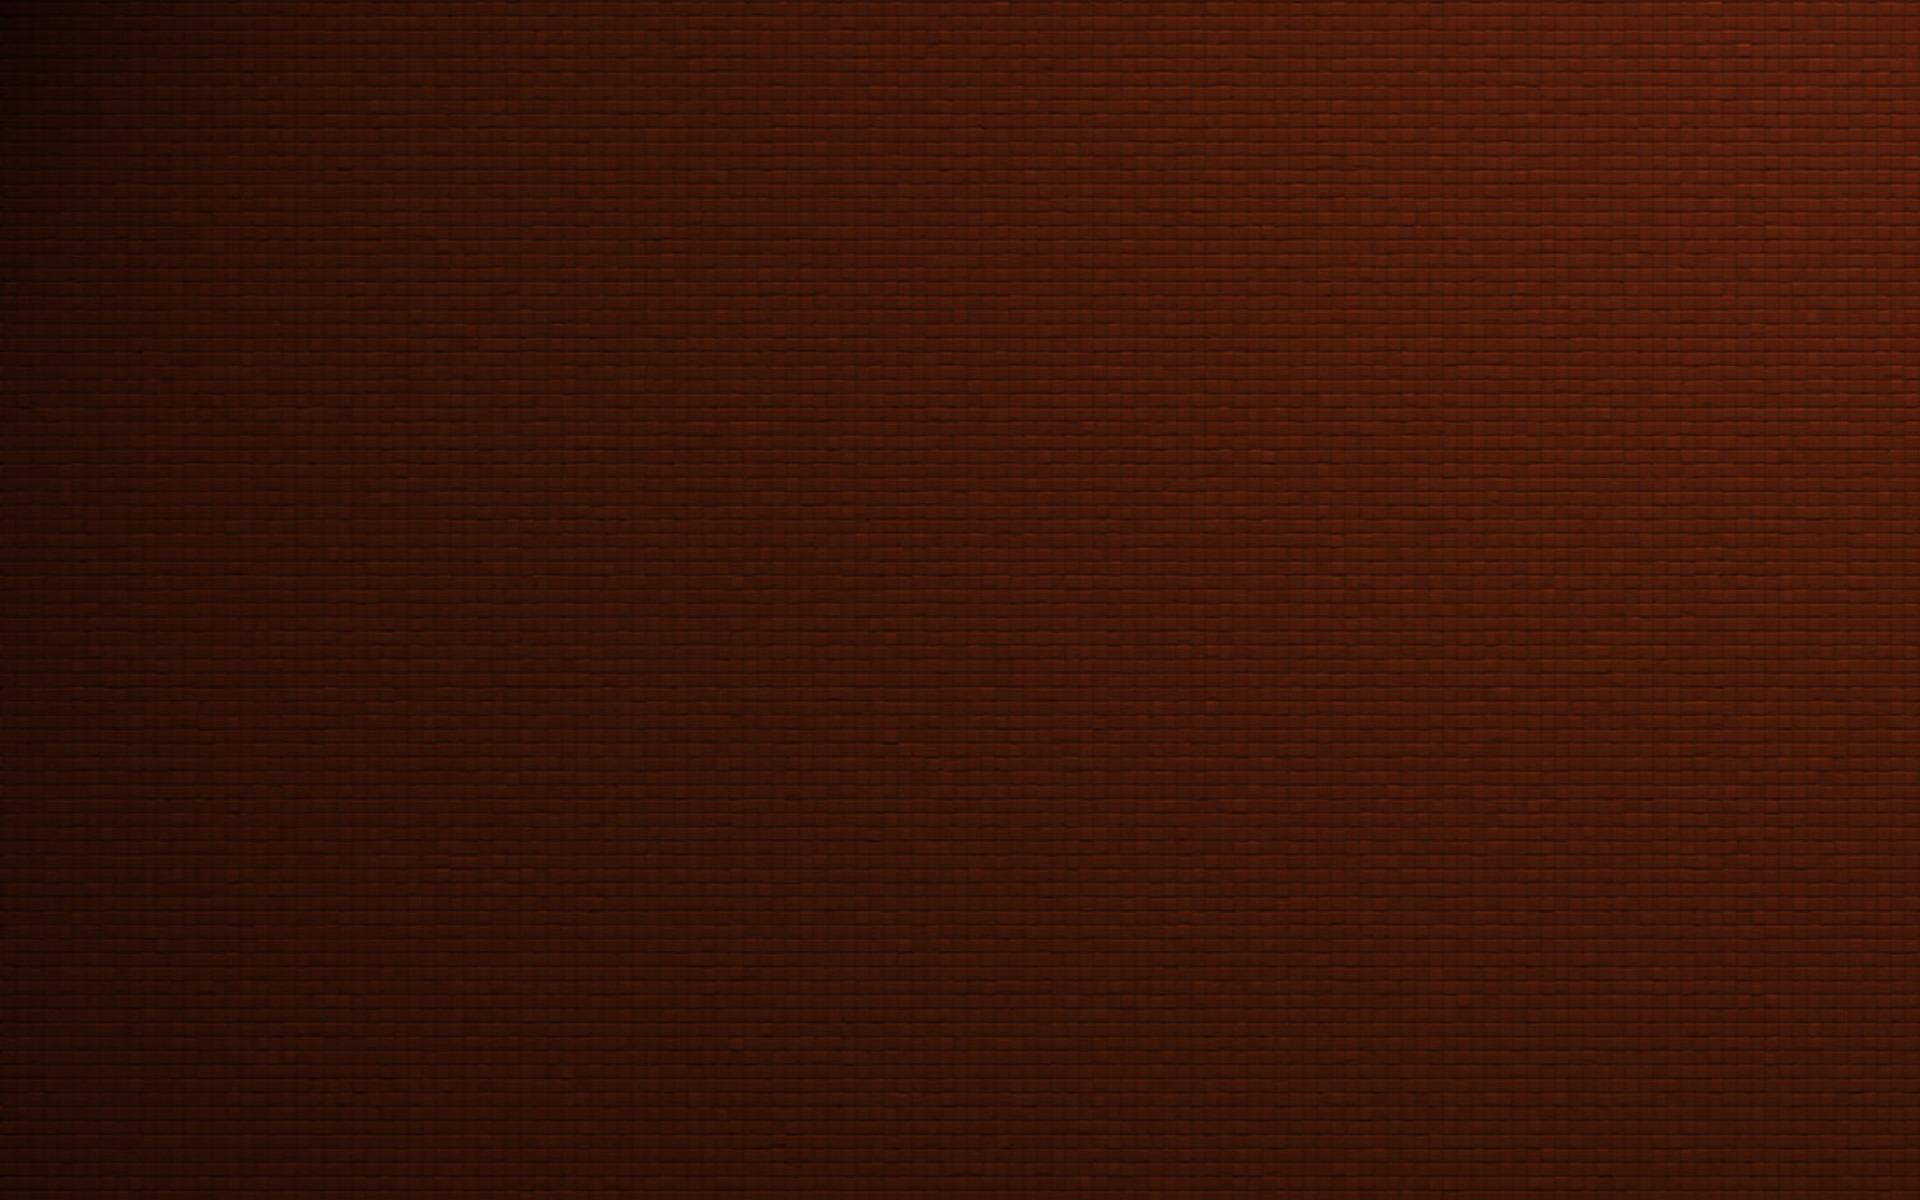 1920x1200 Brown Windows Wallpaper Abstract Brown Wallpaper 1920x1200